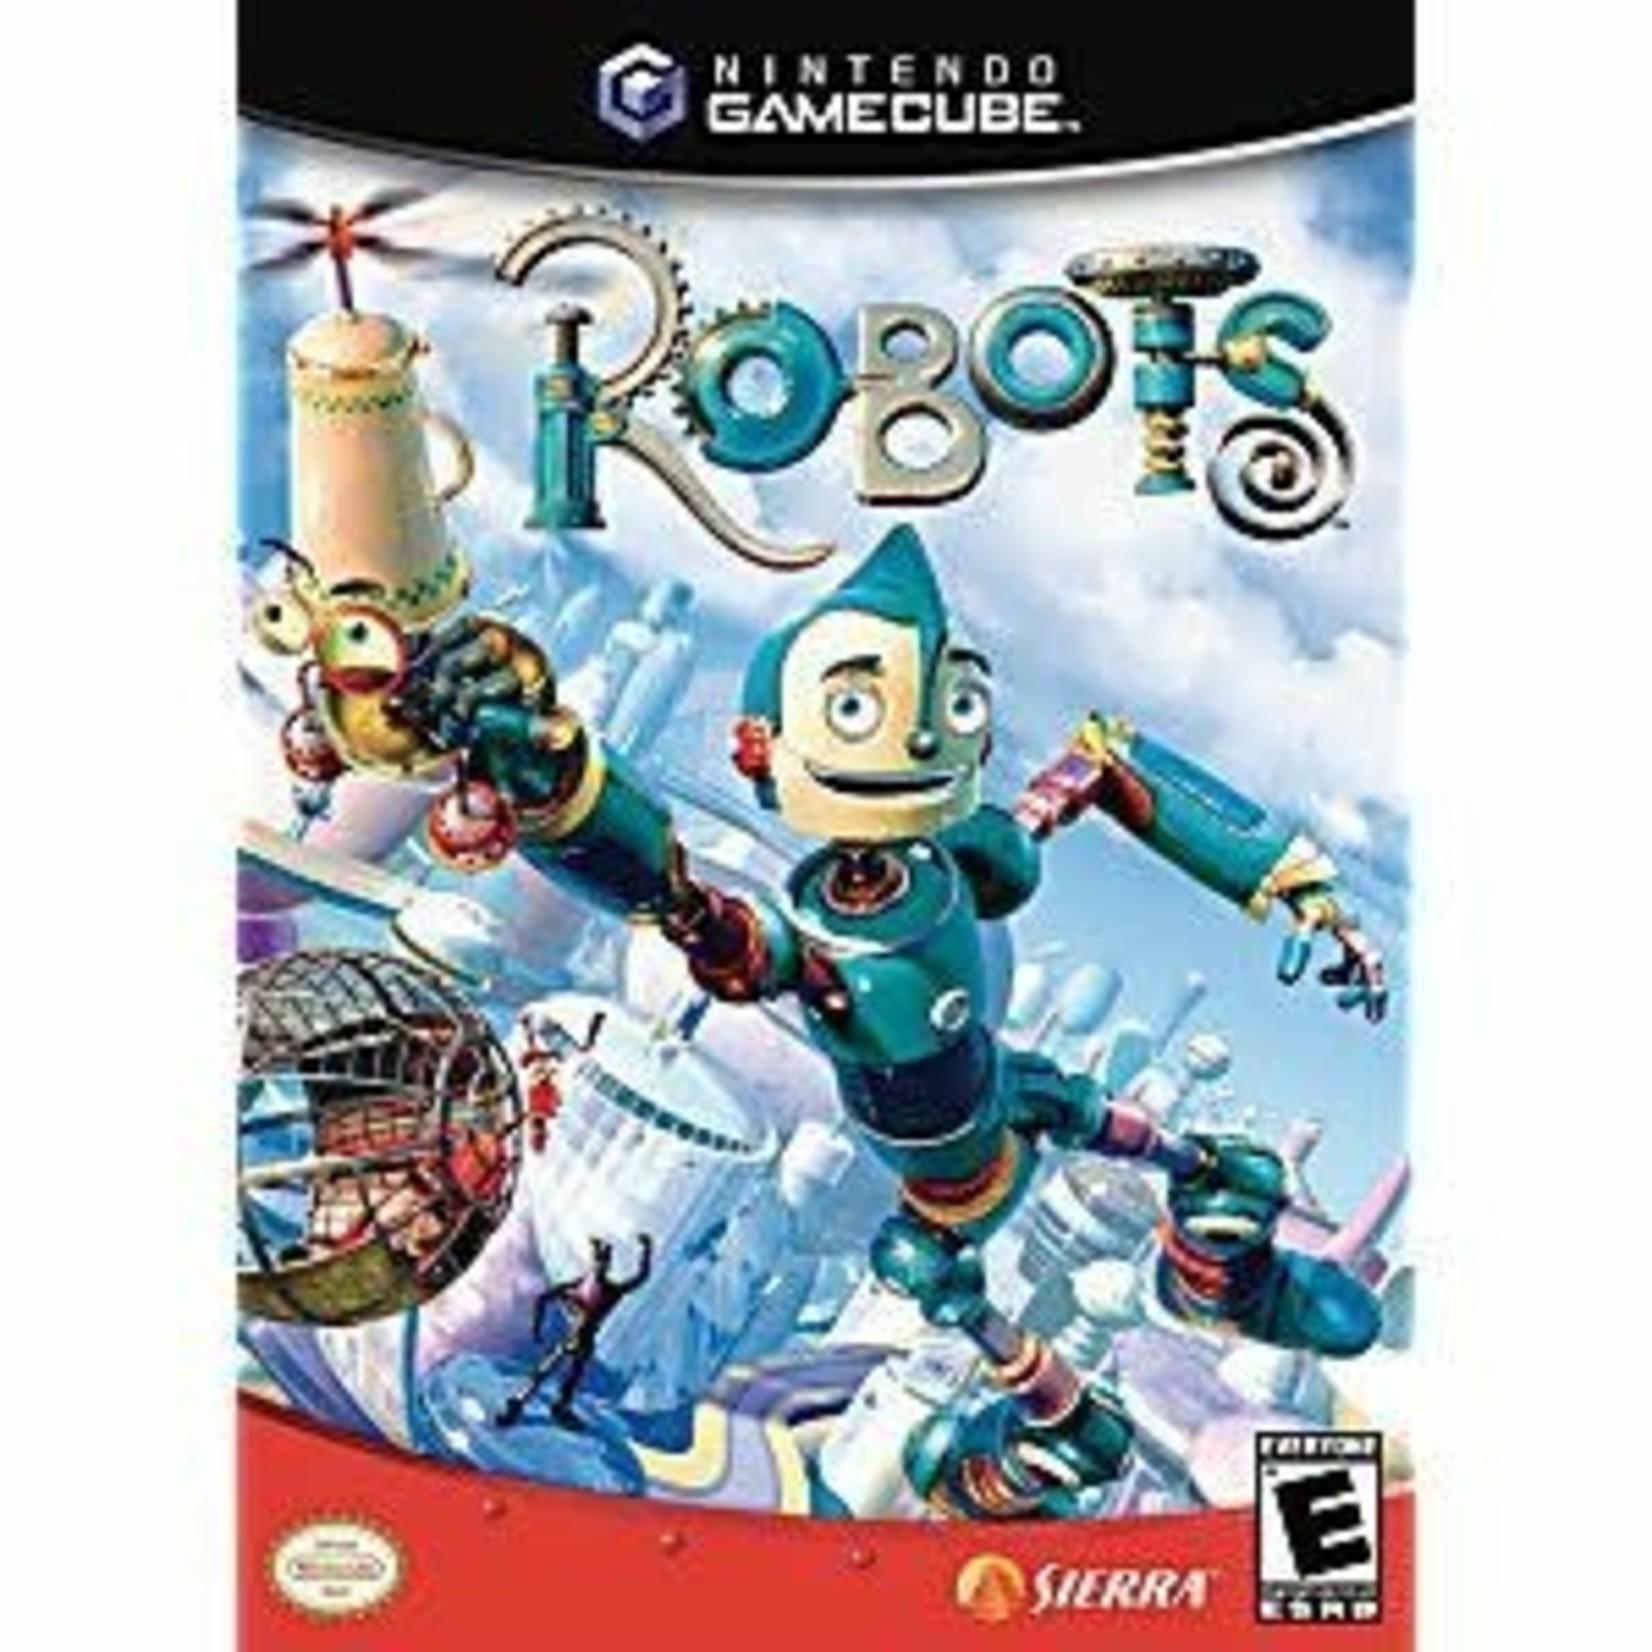 GCU-ROBOTS